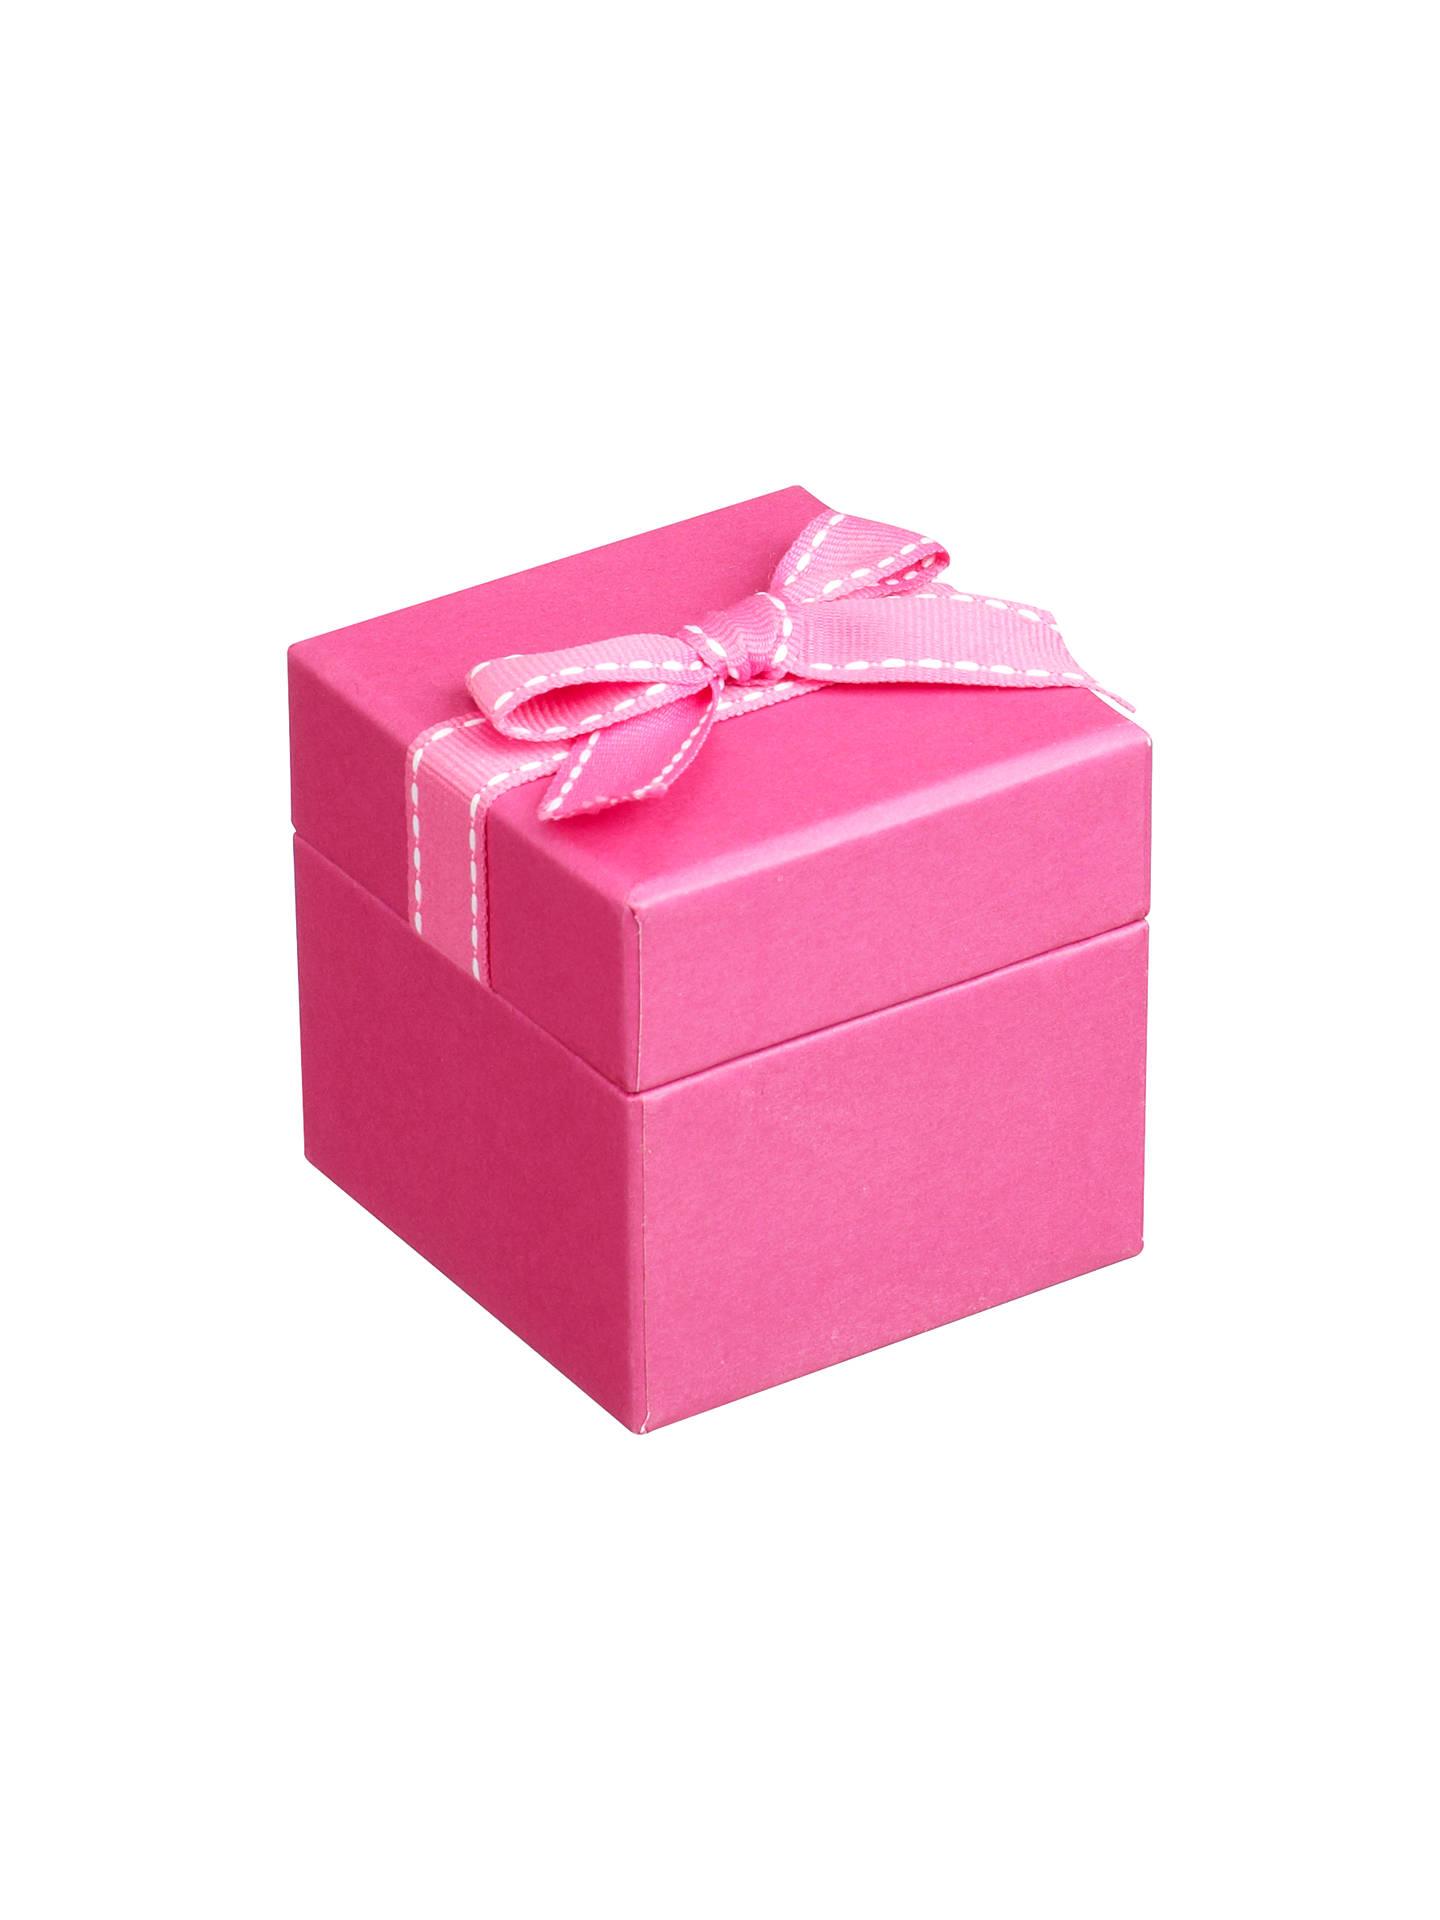 John Lewis Jewellery Gift Box Pink At John Lewis Partners